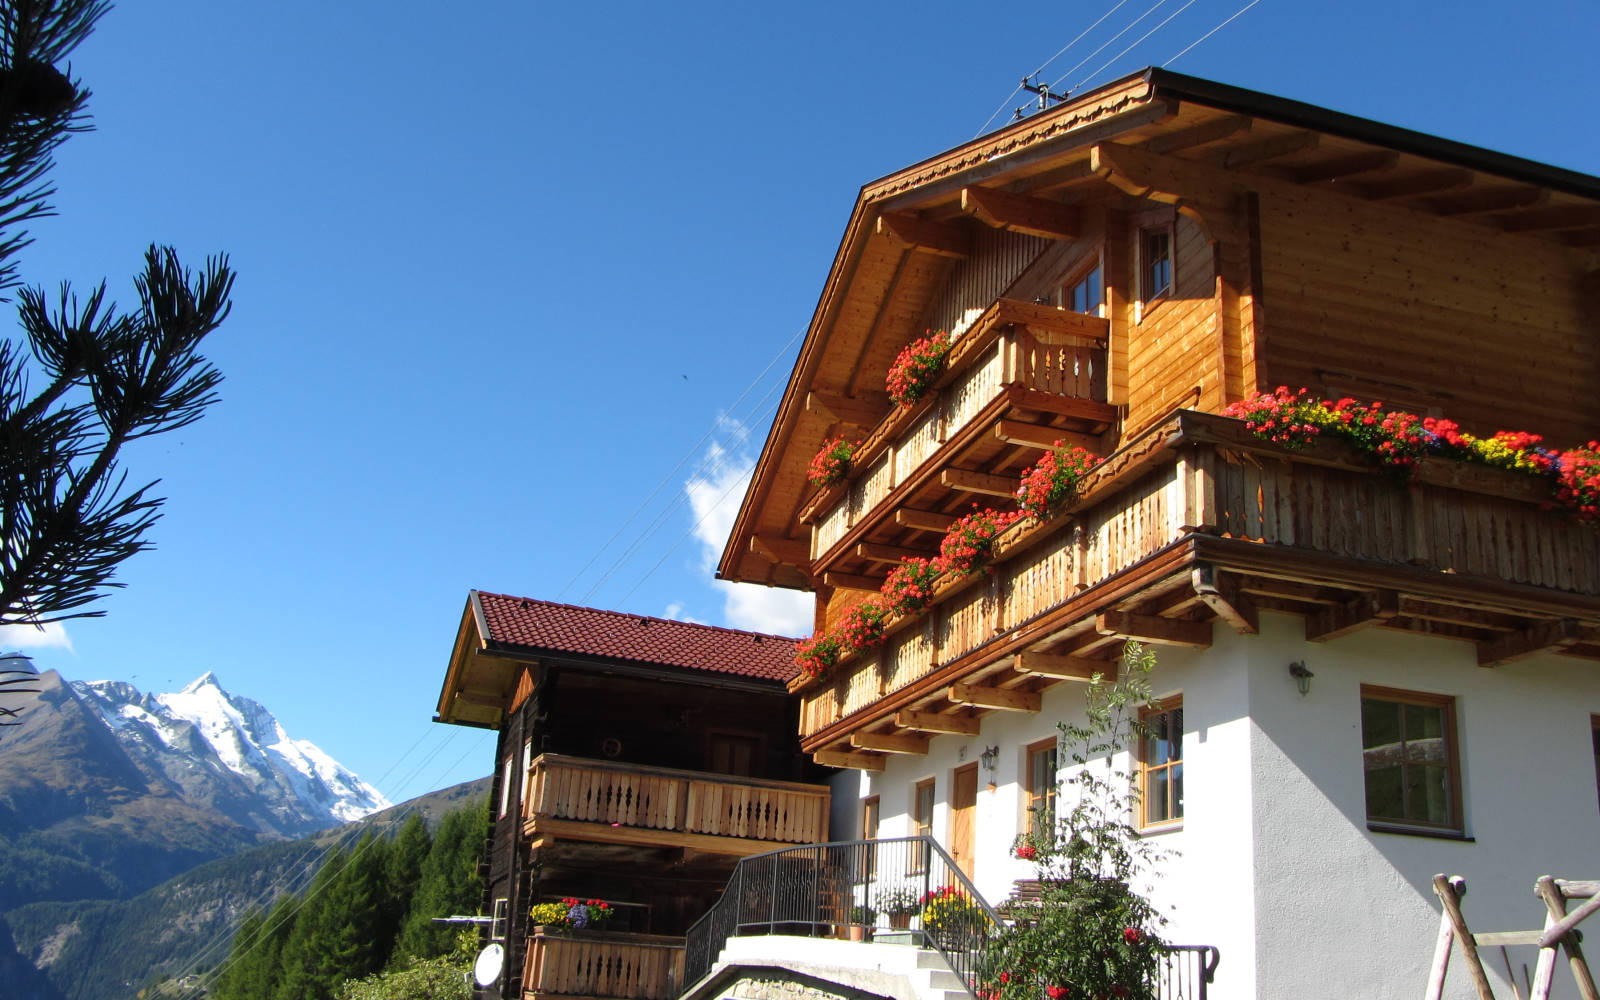 Der Seppenbauerhof mit traumhaftem Bergpanorama